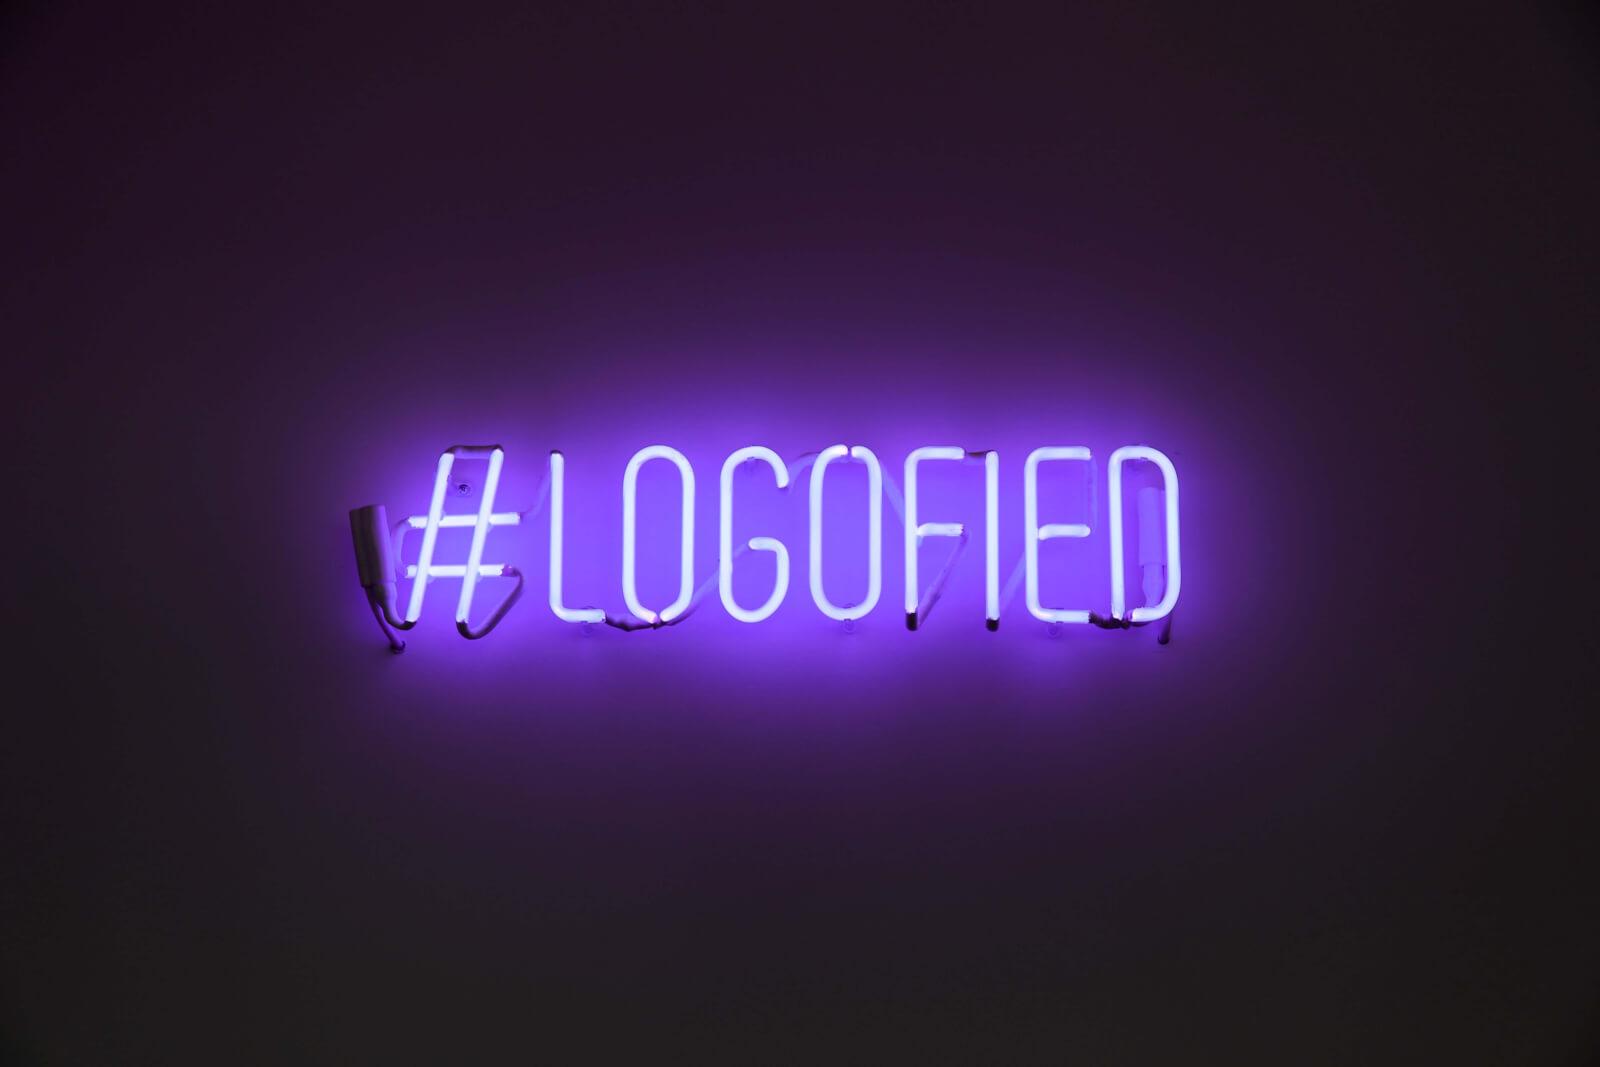 LOGO By Lori Goldstein